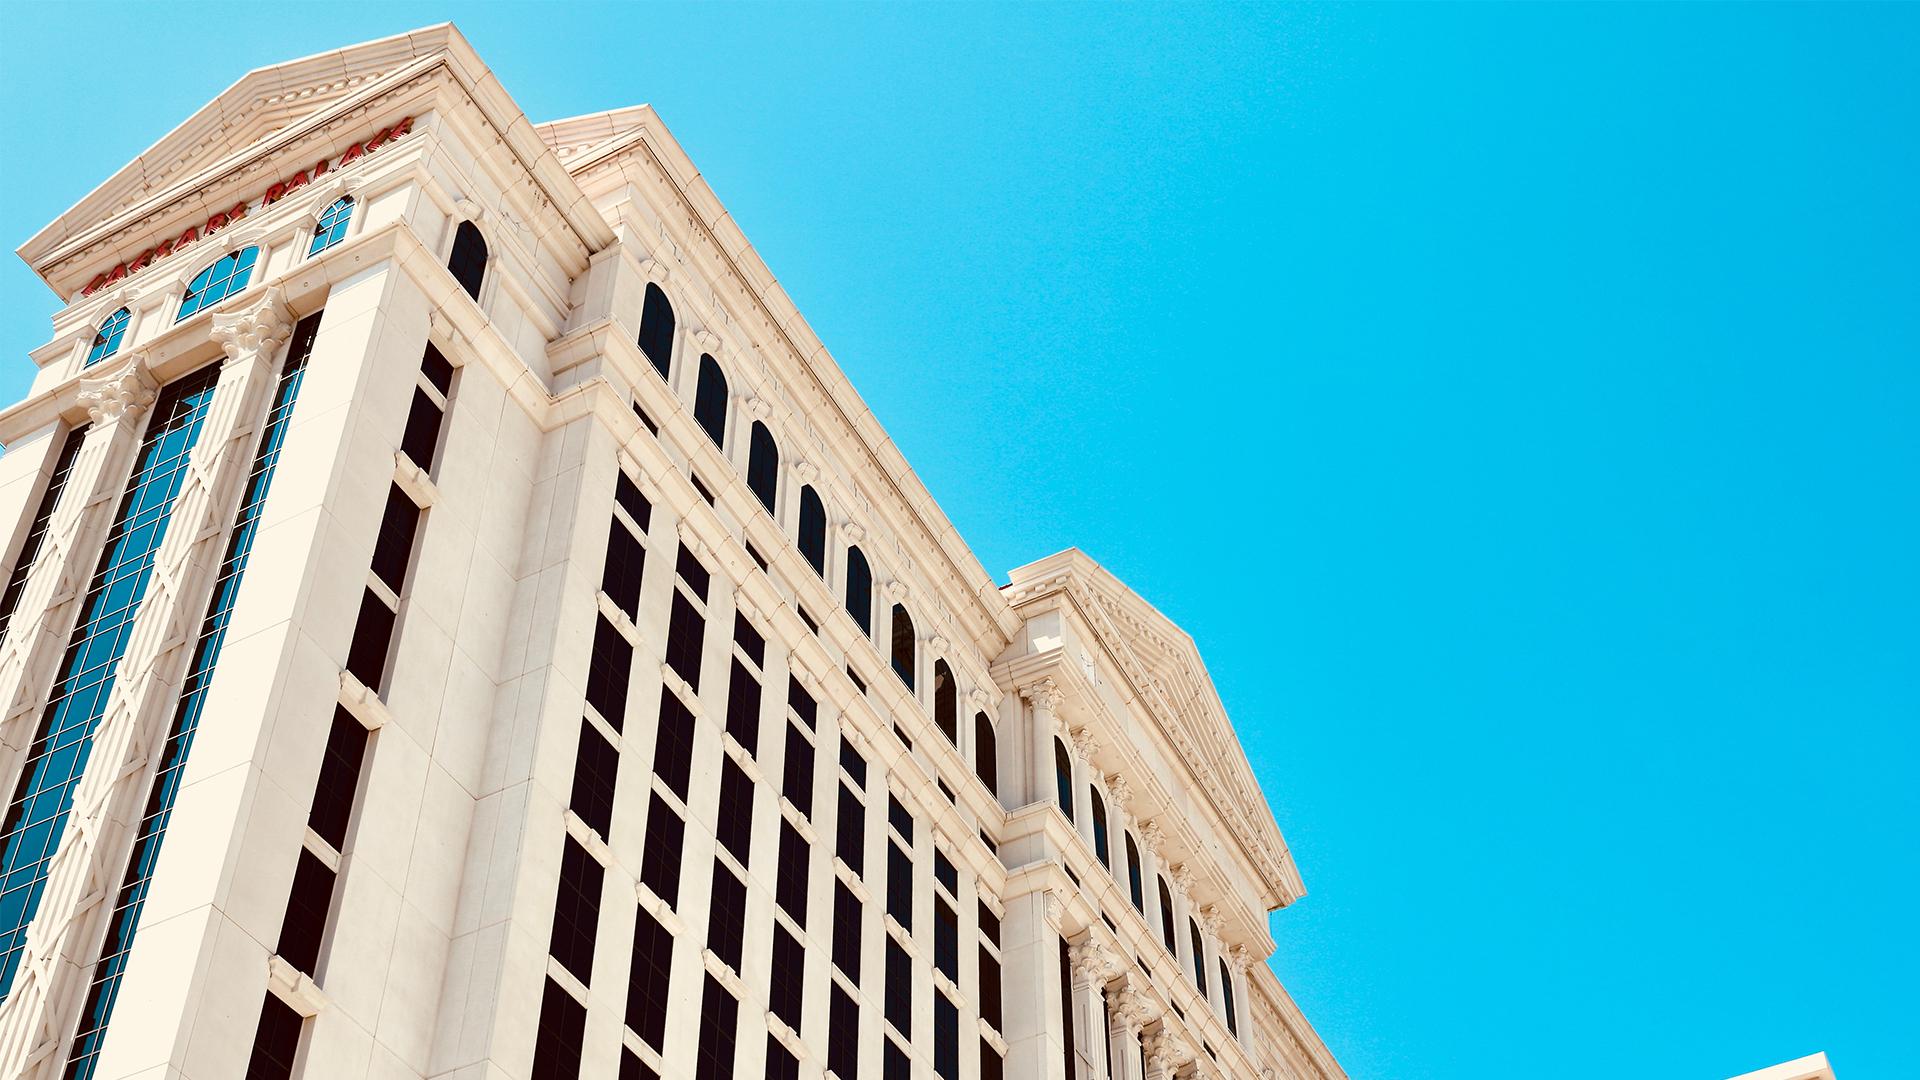 4 Stocks To Gamble On This Holiday Season: Caesars, MGM Resorts, Penn National, And Boyd Gaming